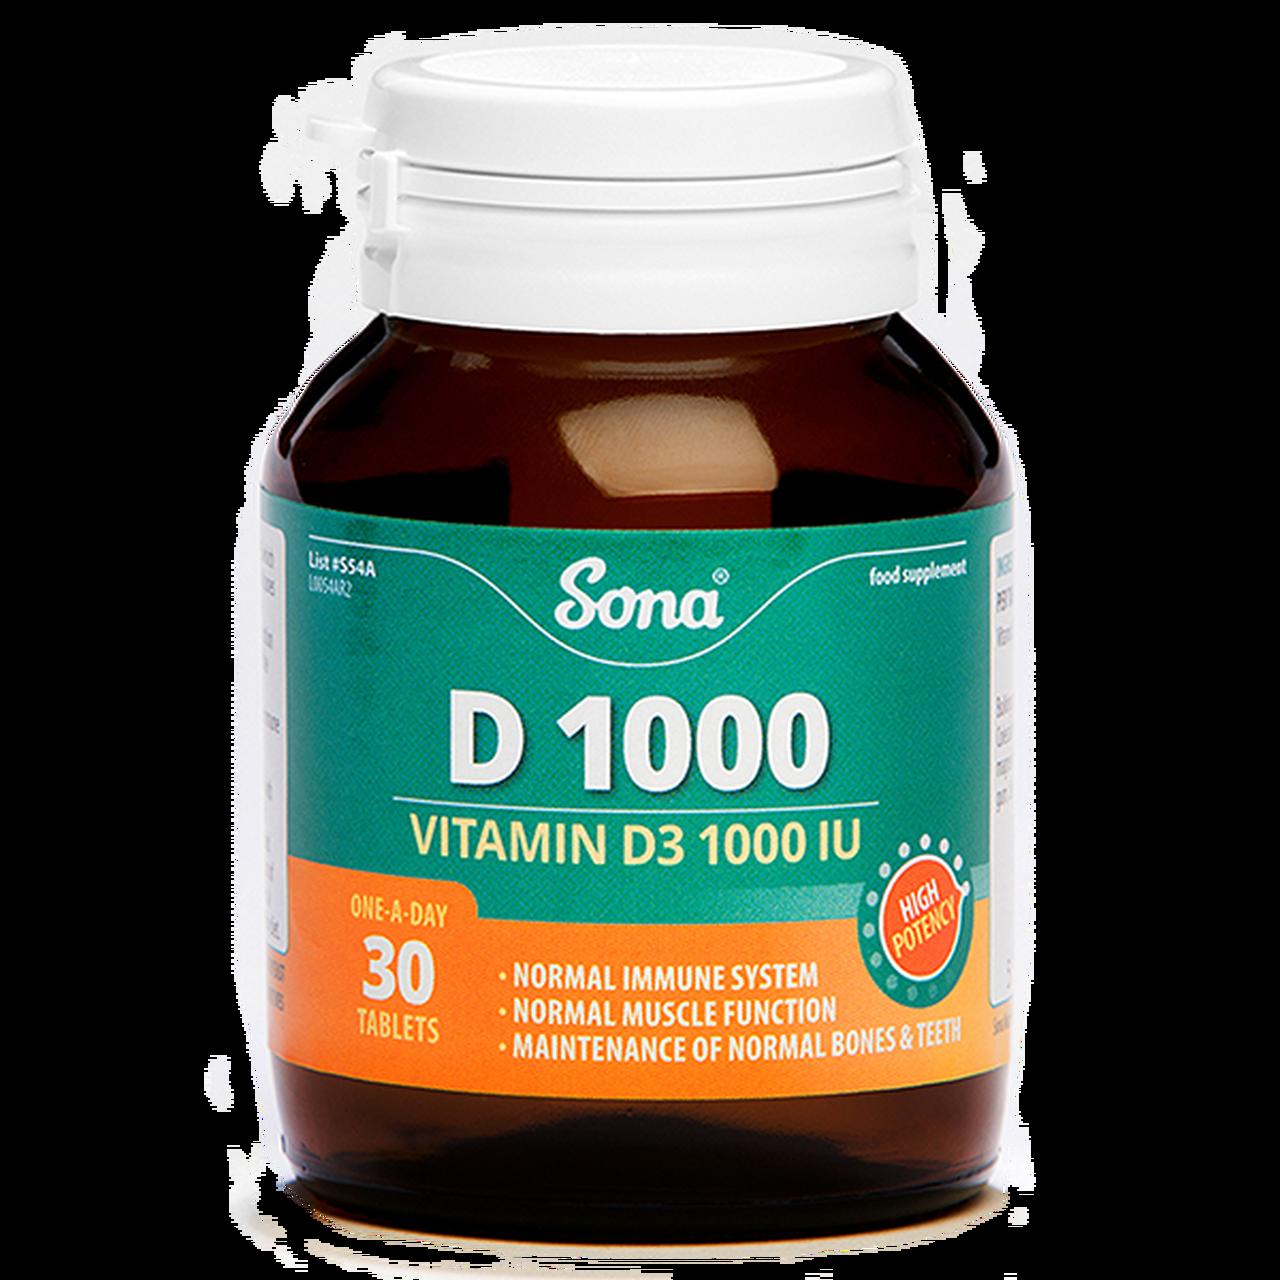 SONA D1000 VITAMIN D3 1000IU TABS (30's)